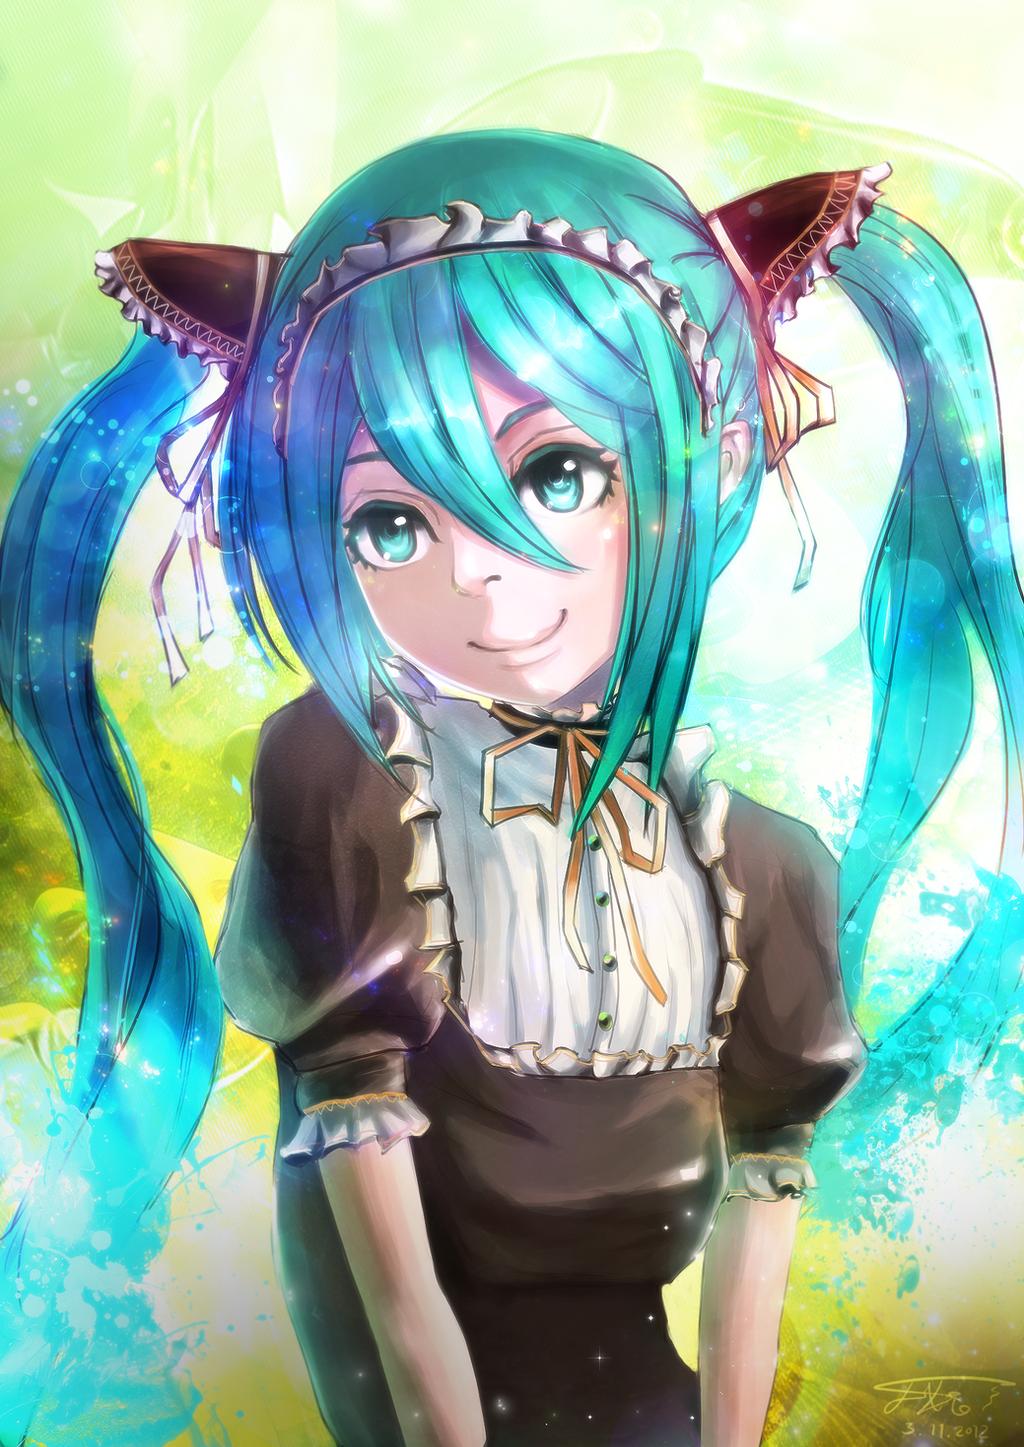 Maid Miku by Cabulb